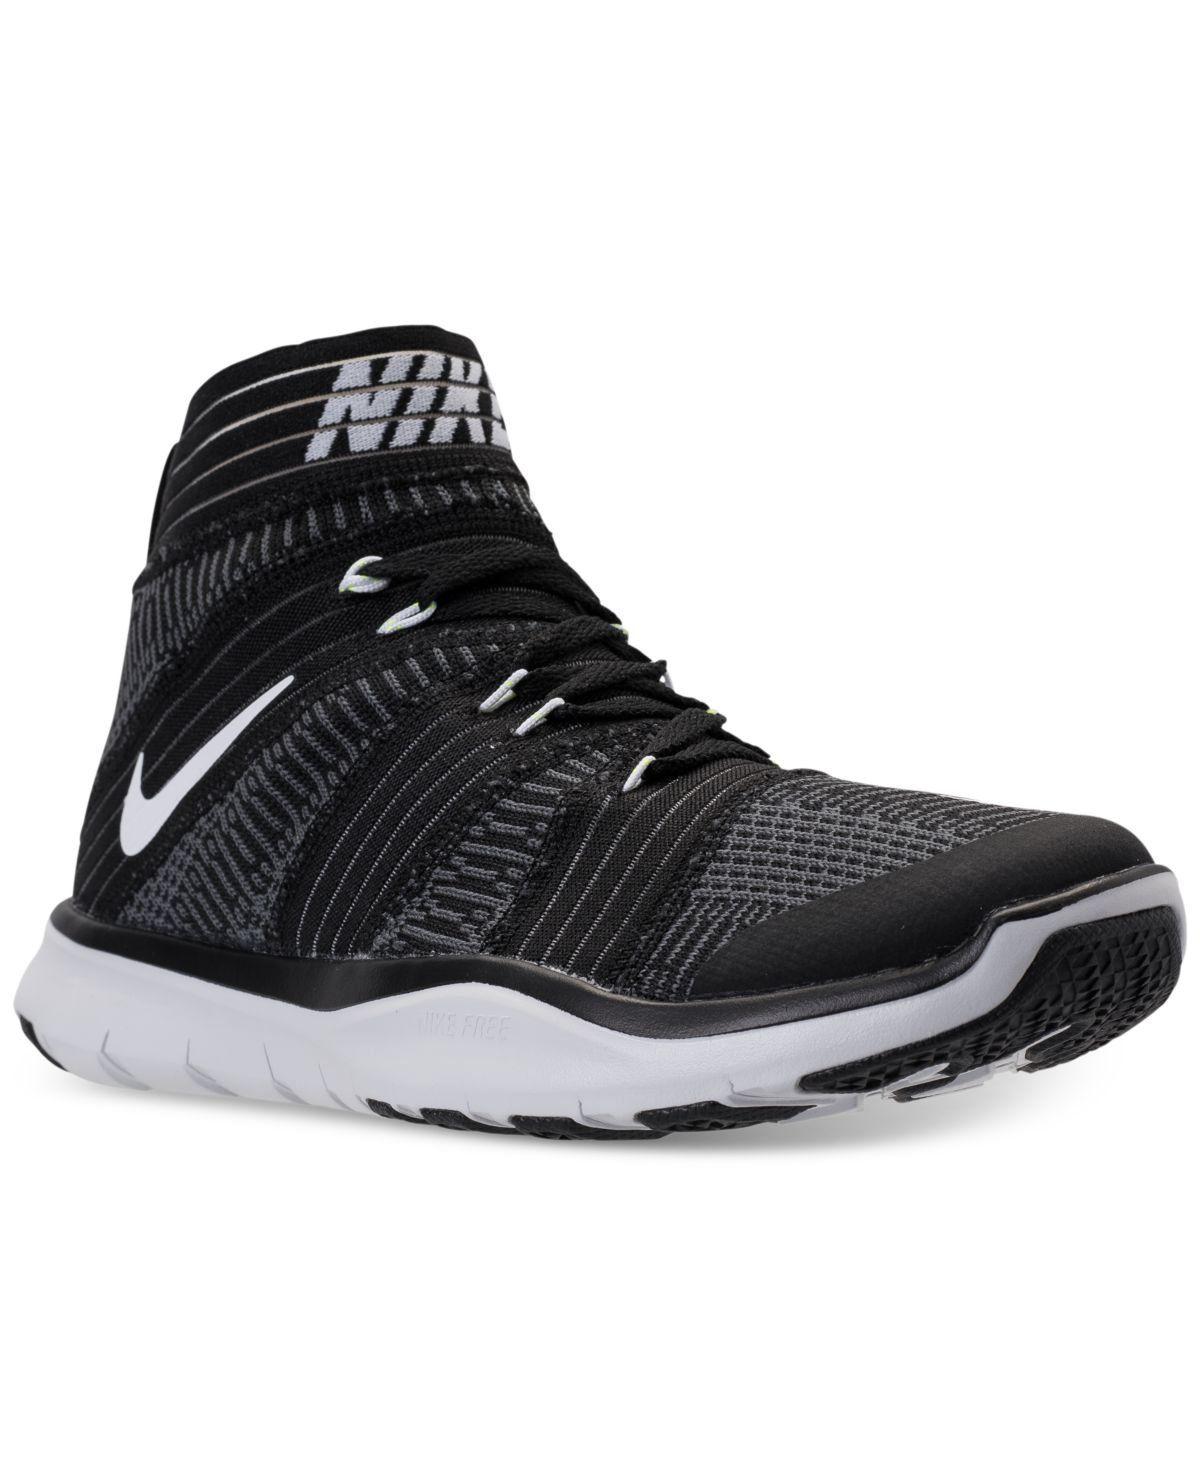 ed4a9d985b6 Nike Mens Free Train Virtue Training Shoes Black White Dark Grey 898052-001  Size 11